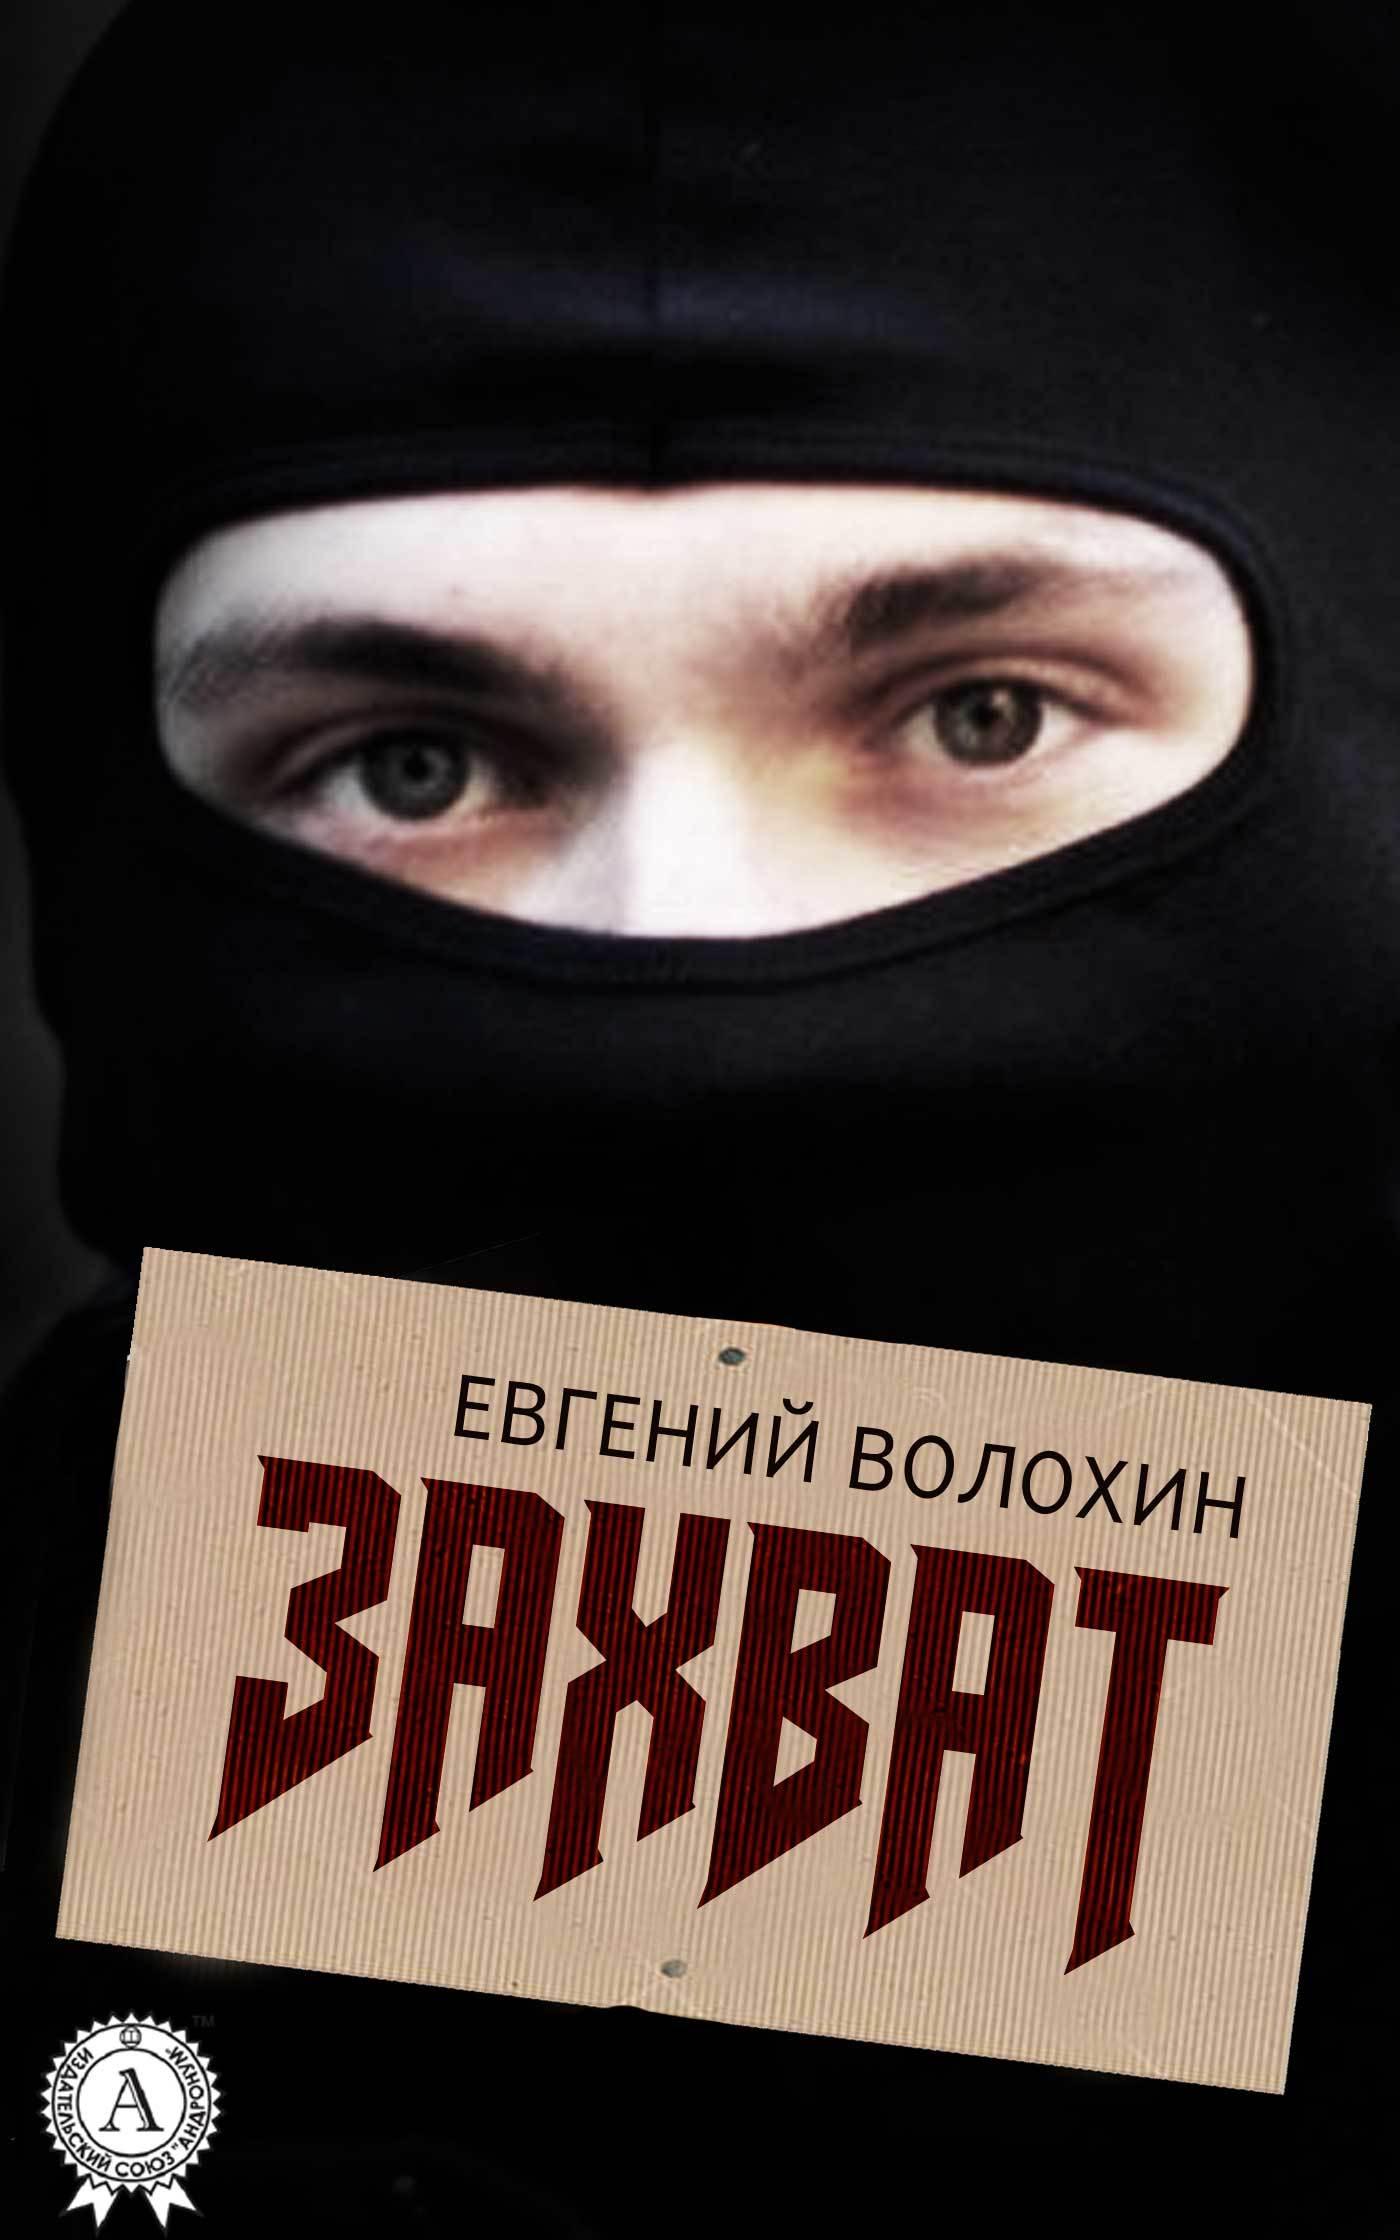 Евгений Волохин - Захват